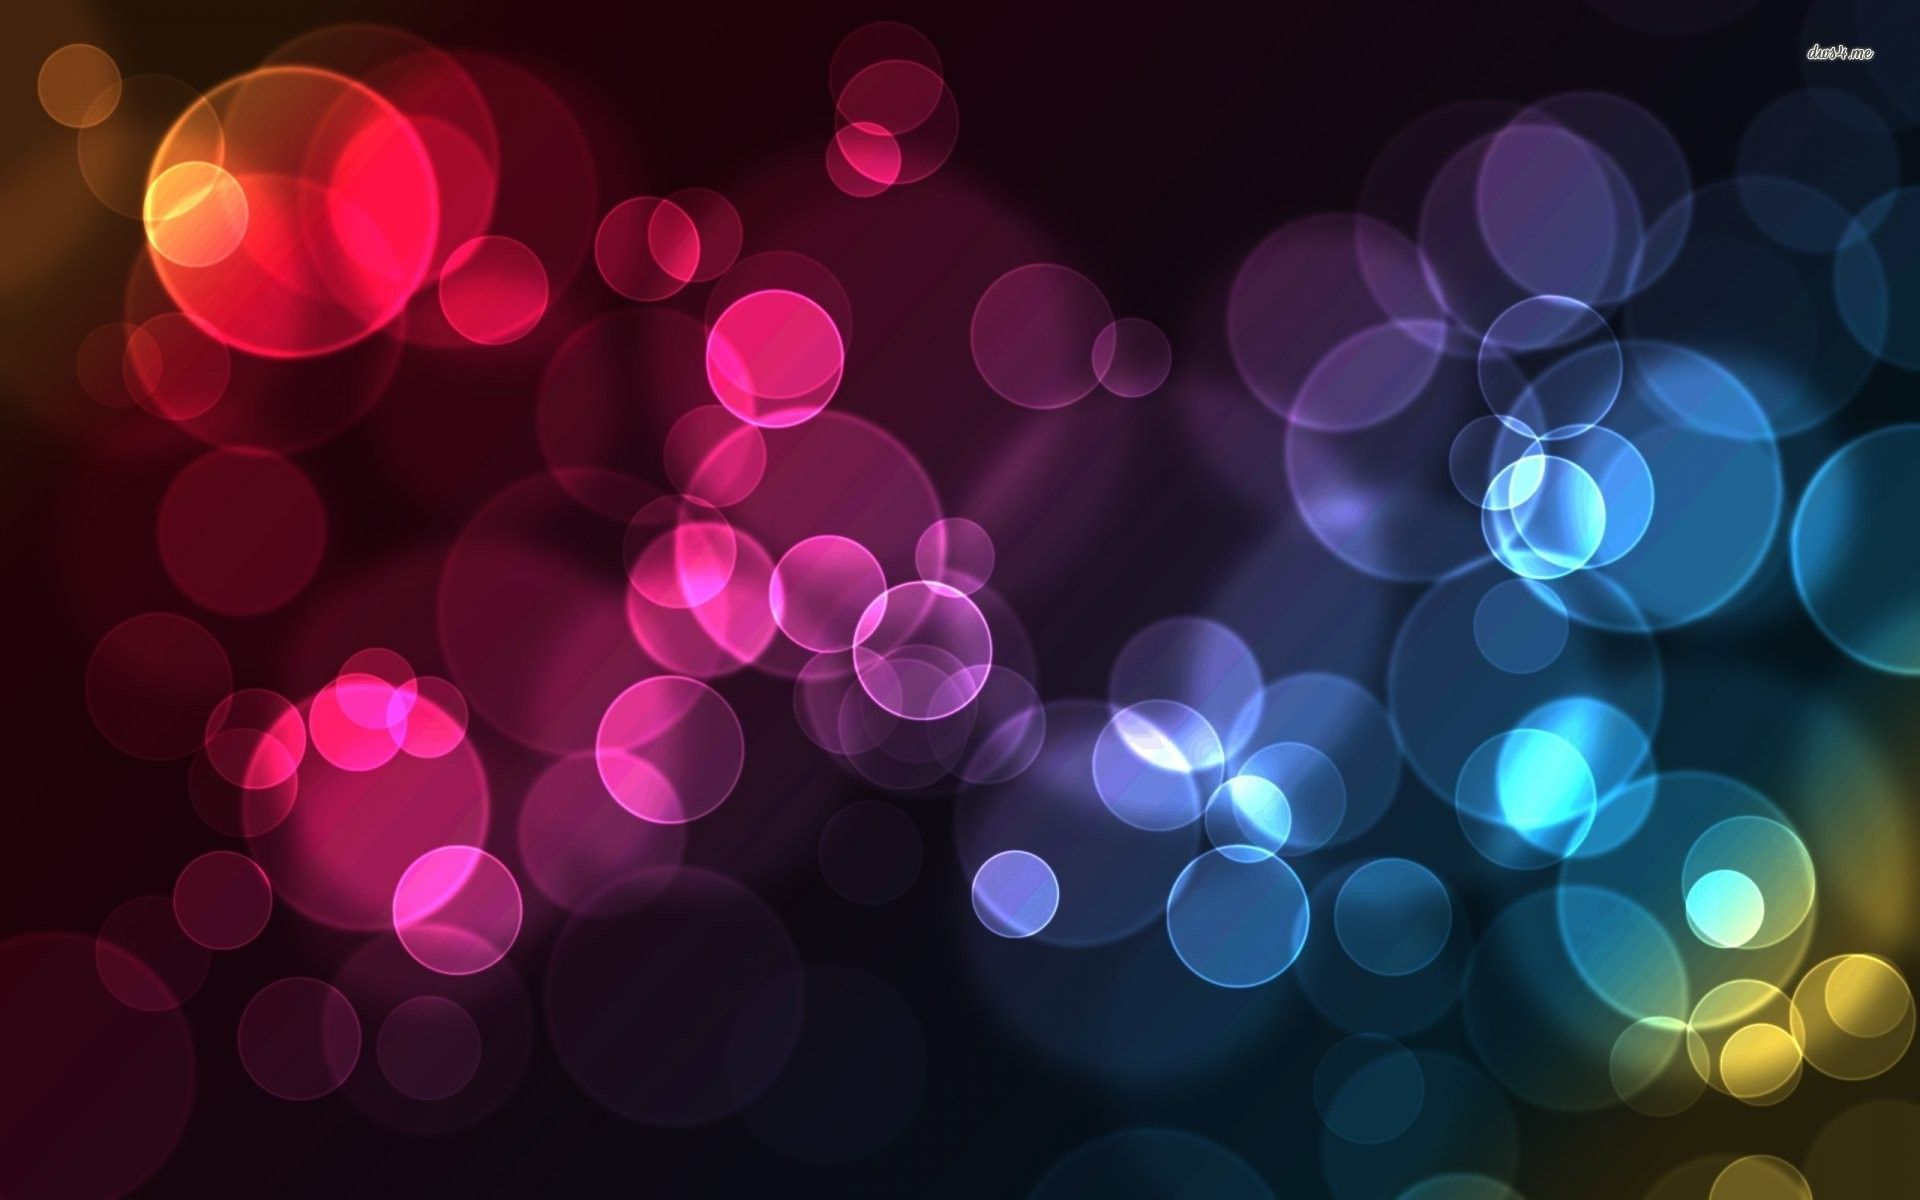 Light pink and blue wallpaper html code - Blue Tech Circles Wallpapers Hd Wallpapers Html Code Home Design